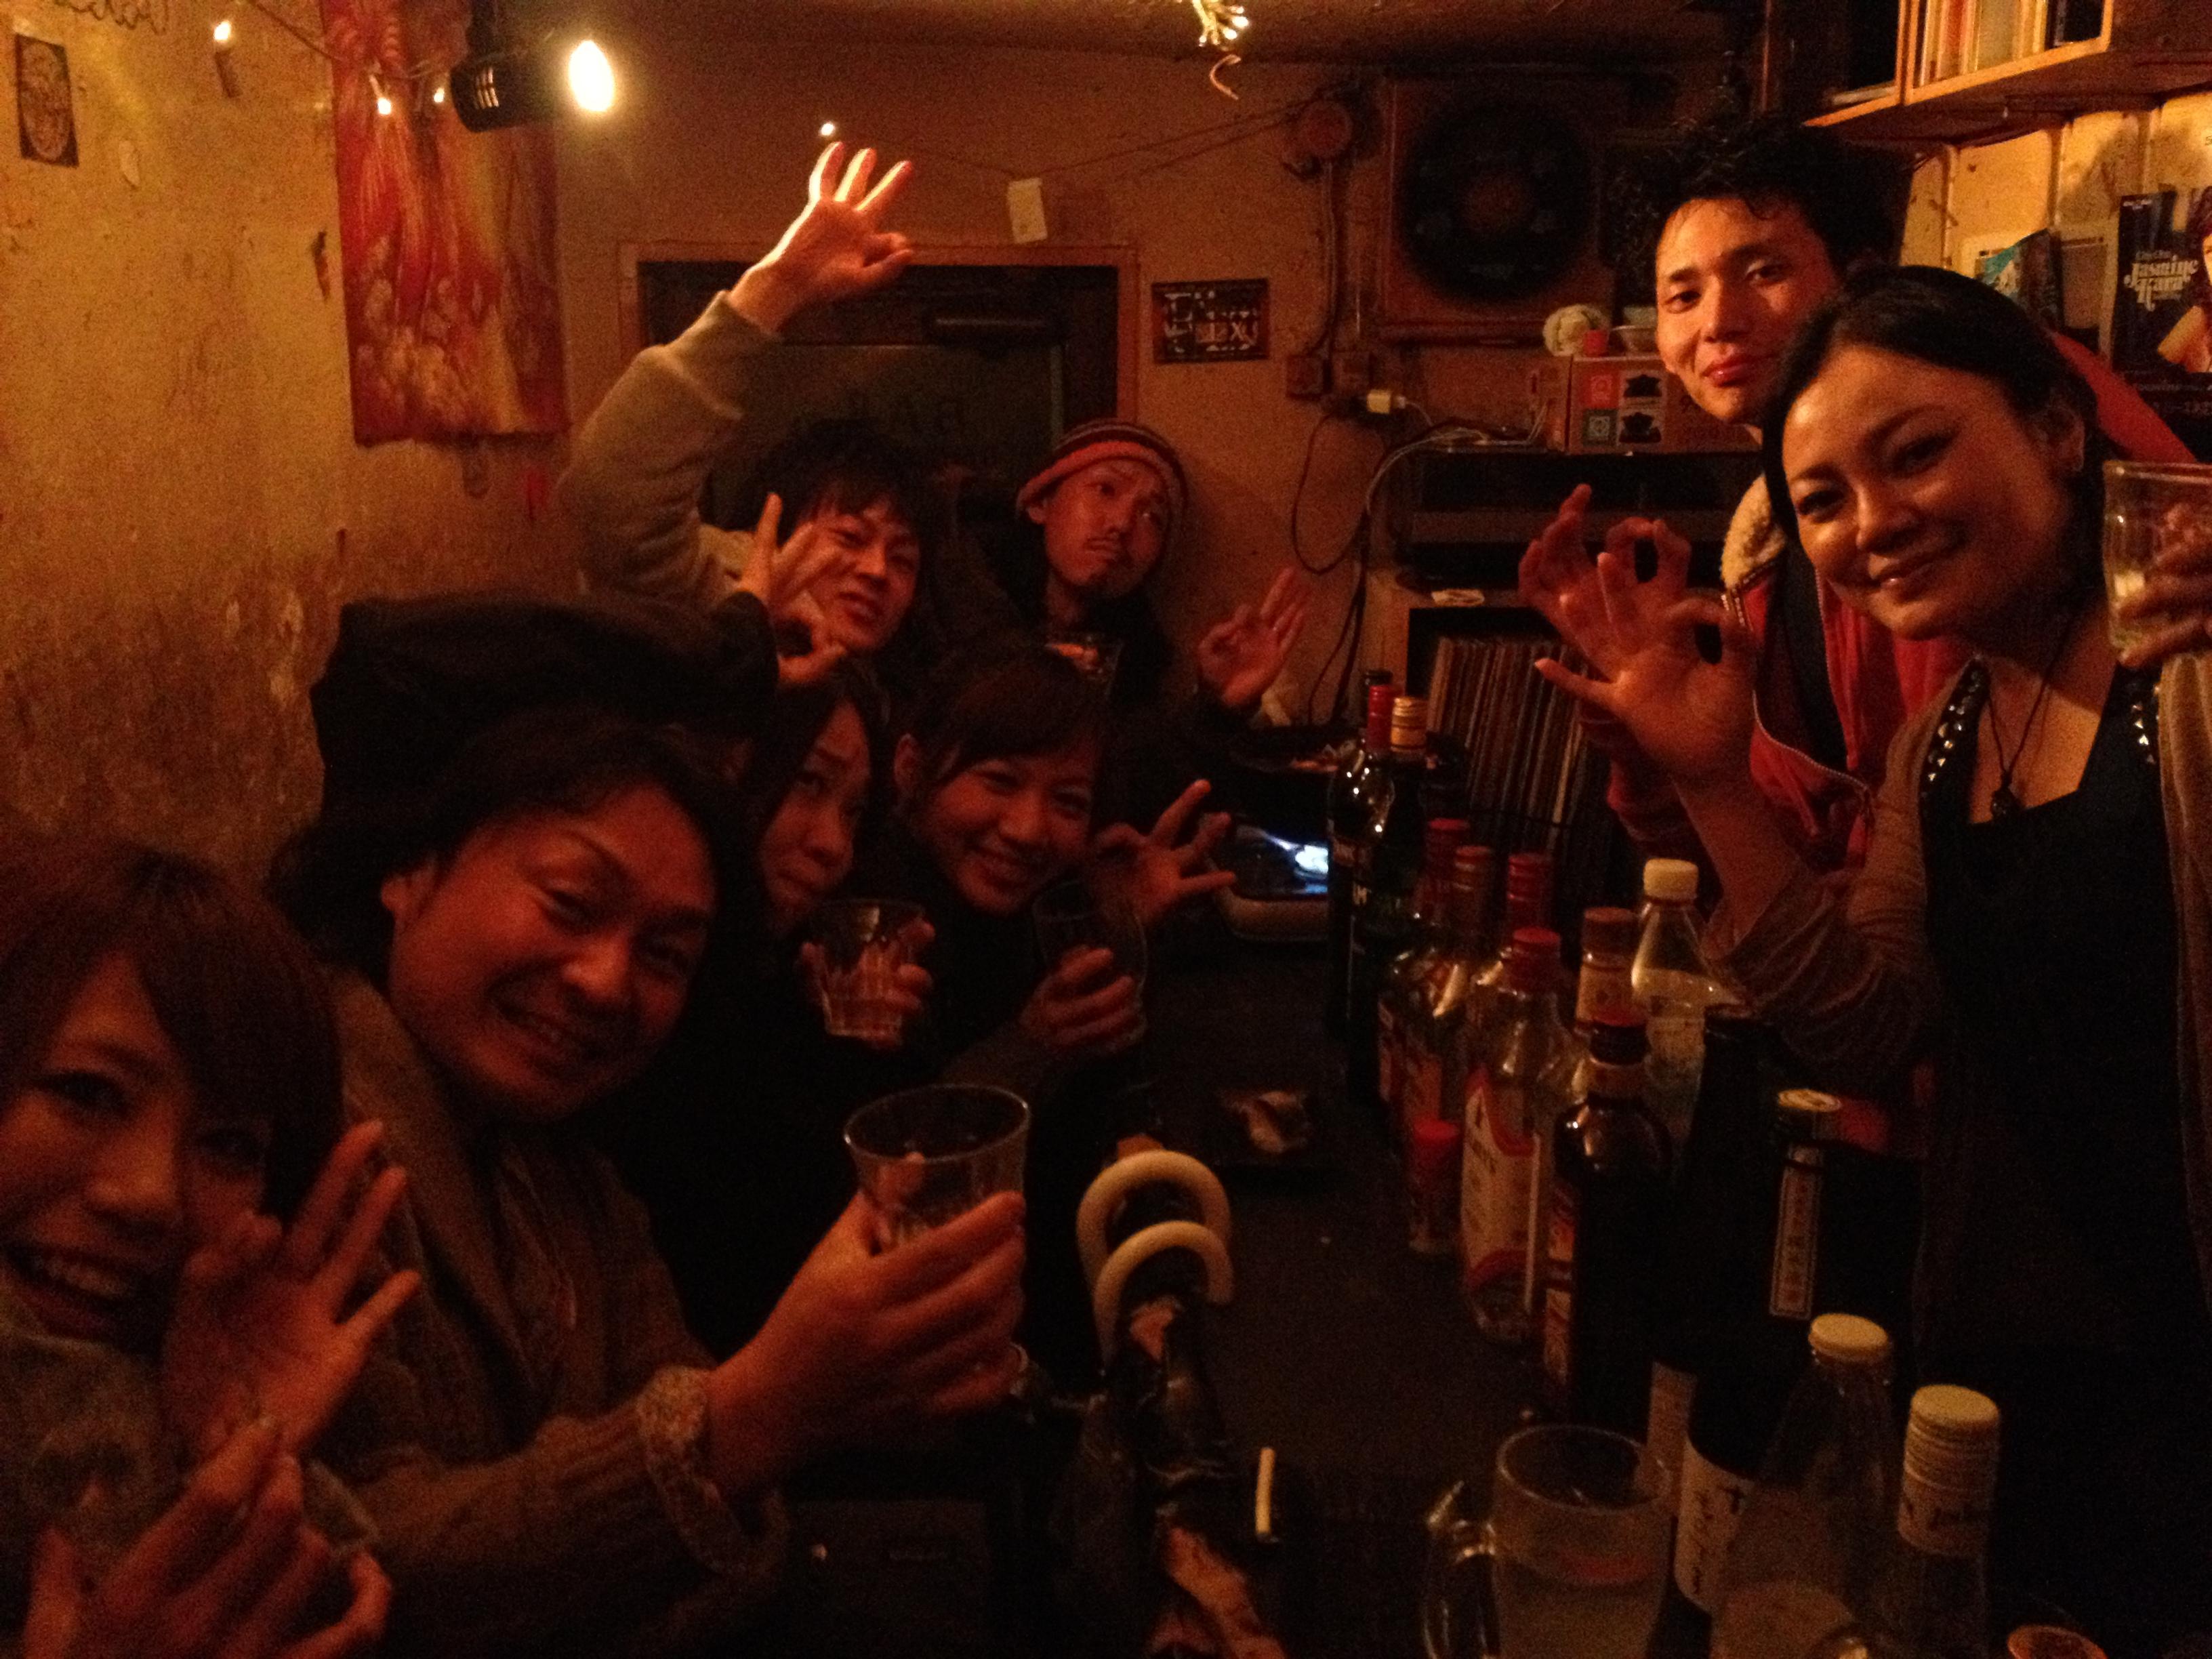 IMG_4712.JPG